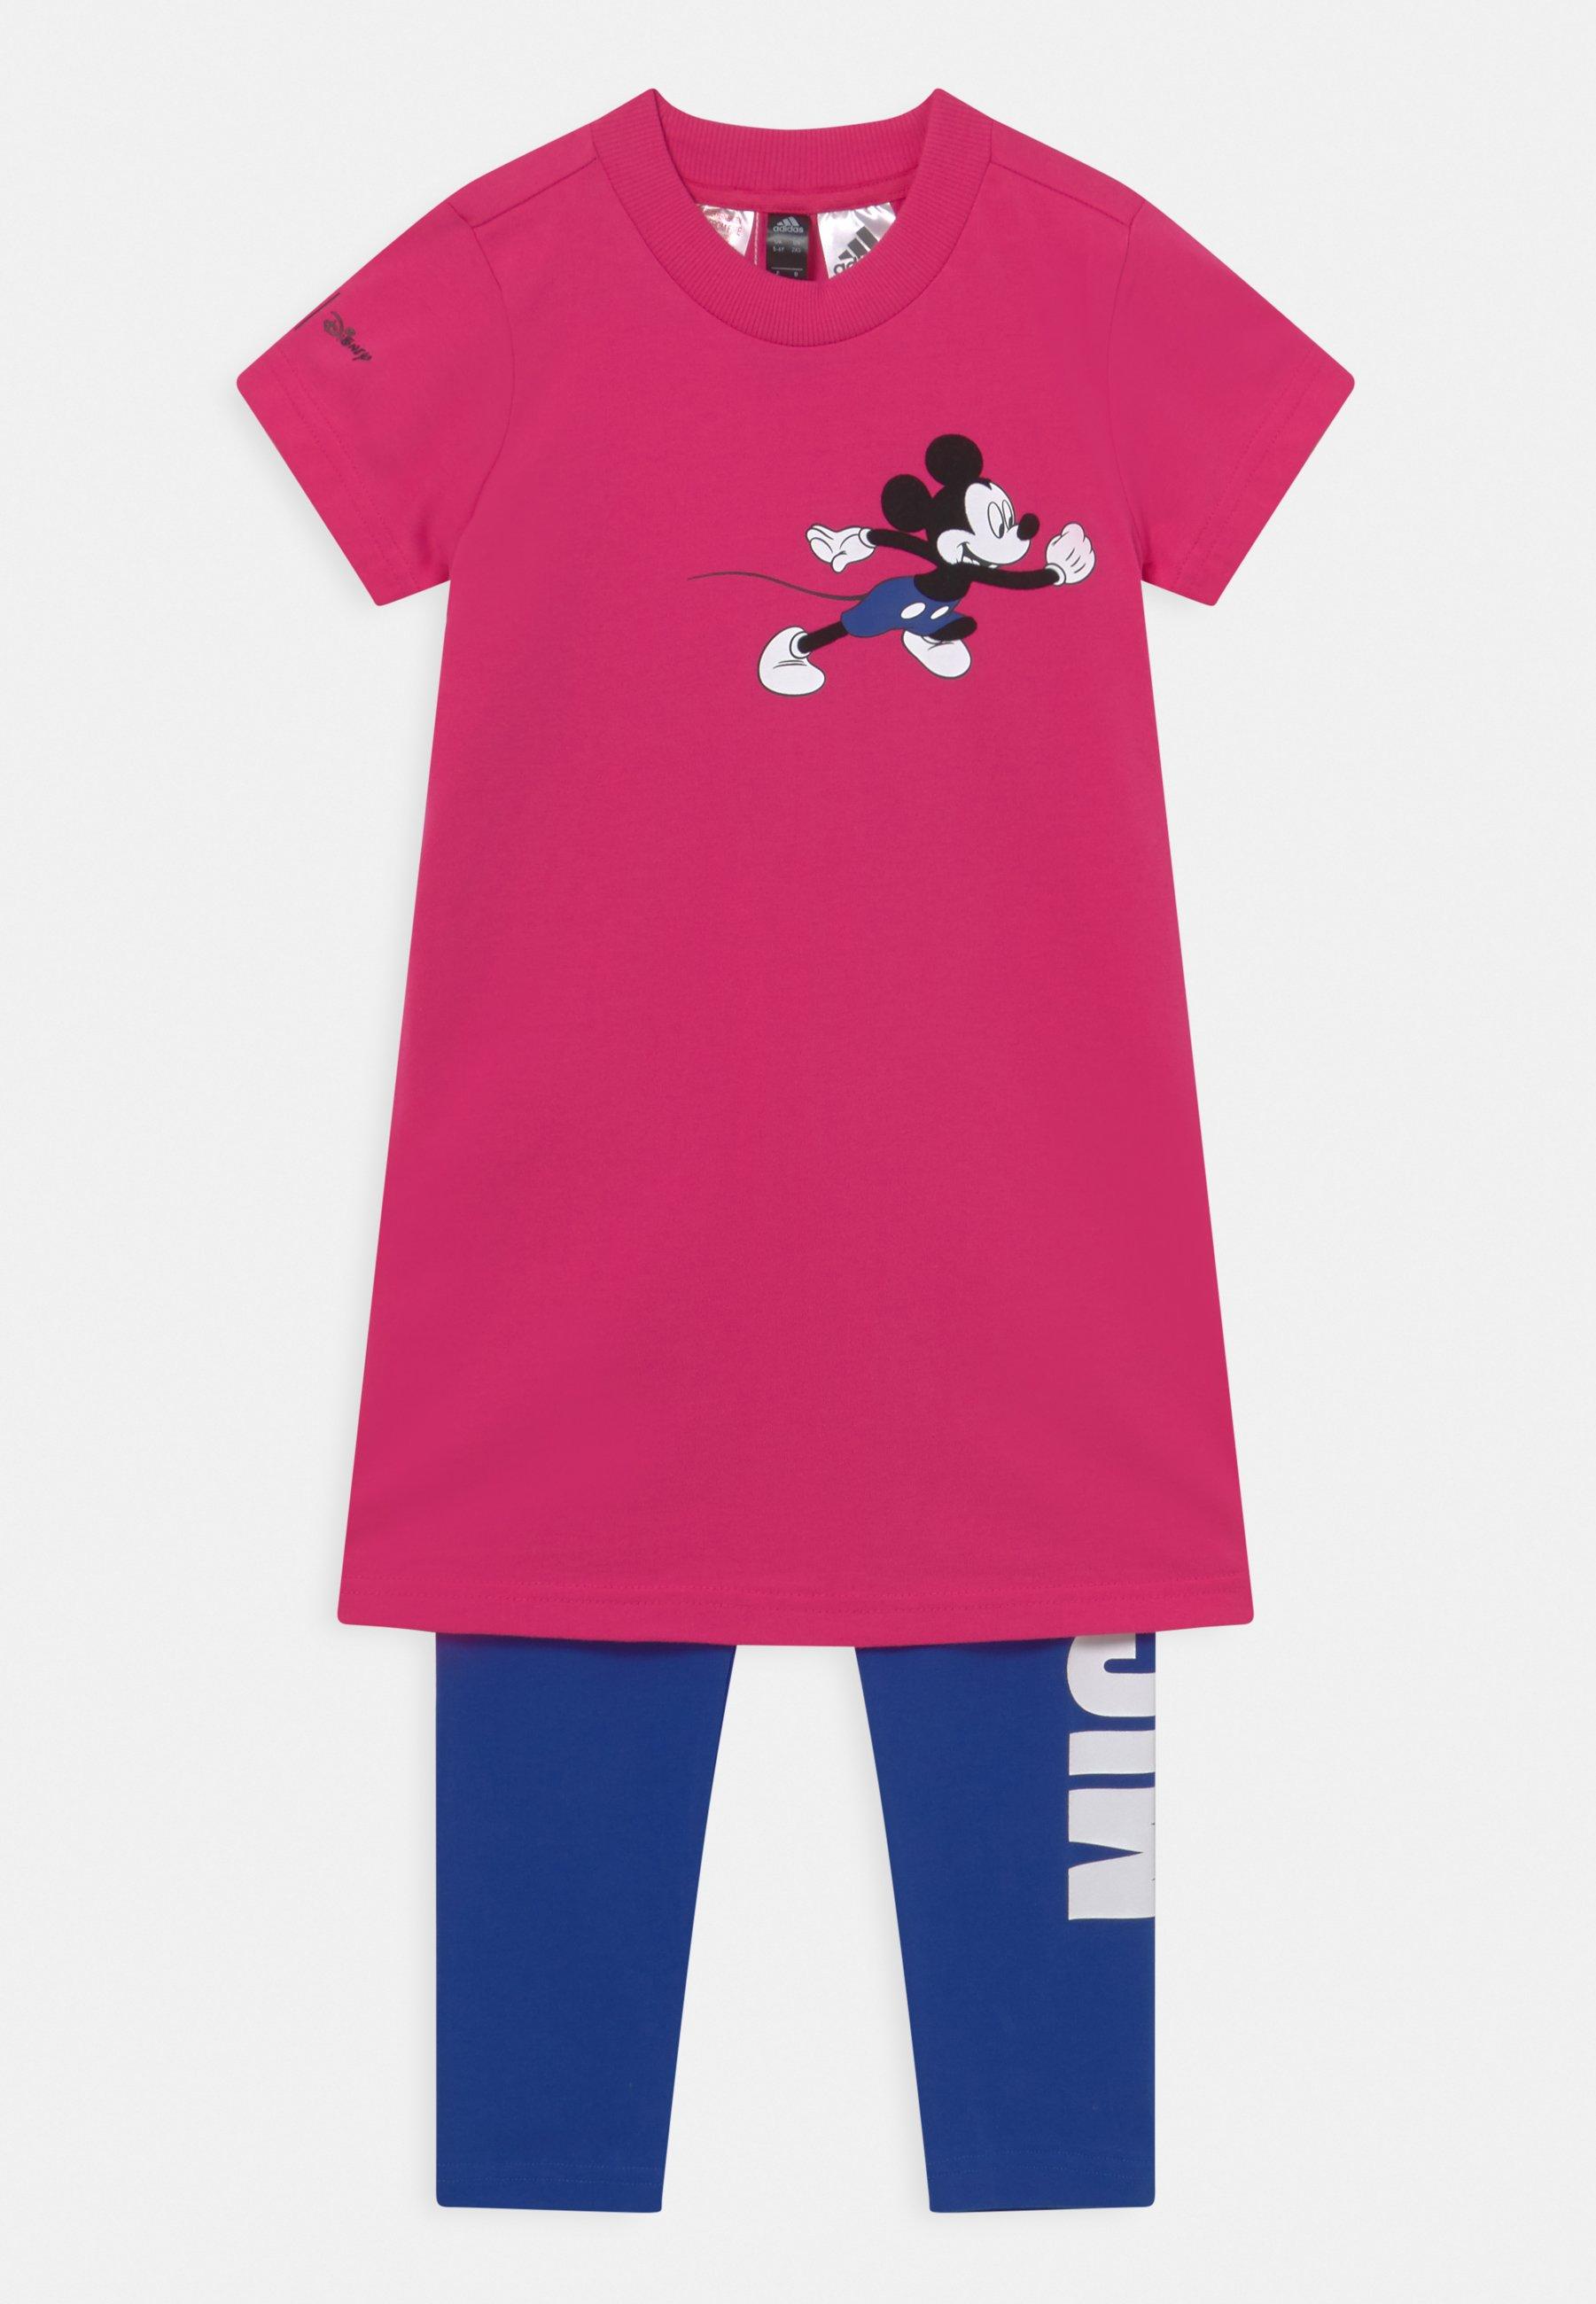 Enfant DISNEY MICKEY MOUSE SUMMER SET - Robe de sport